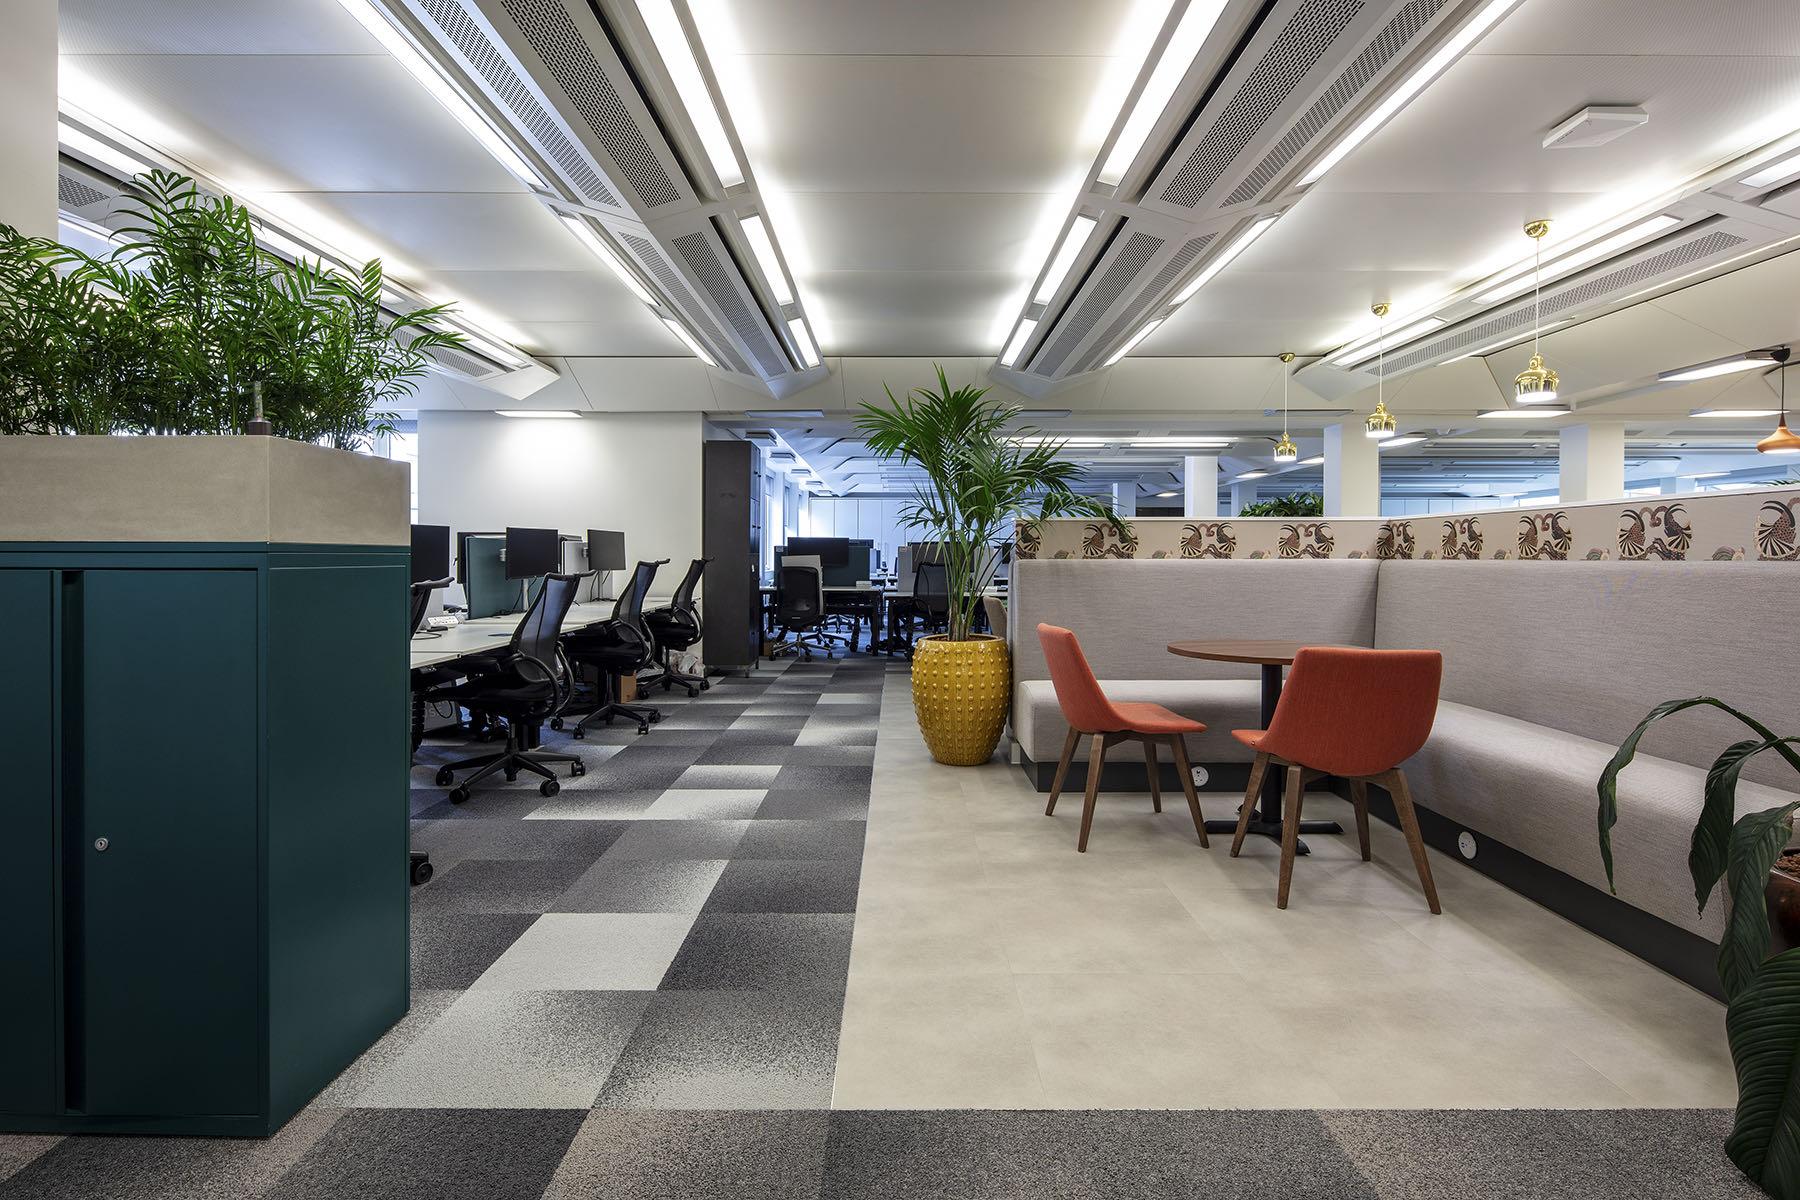 A Look Inside Knight Frank's New London Office